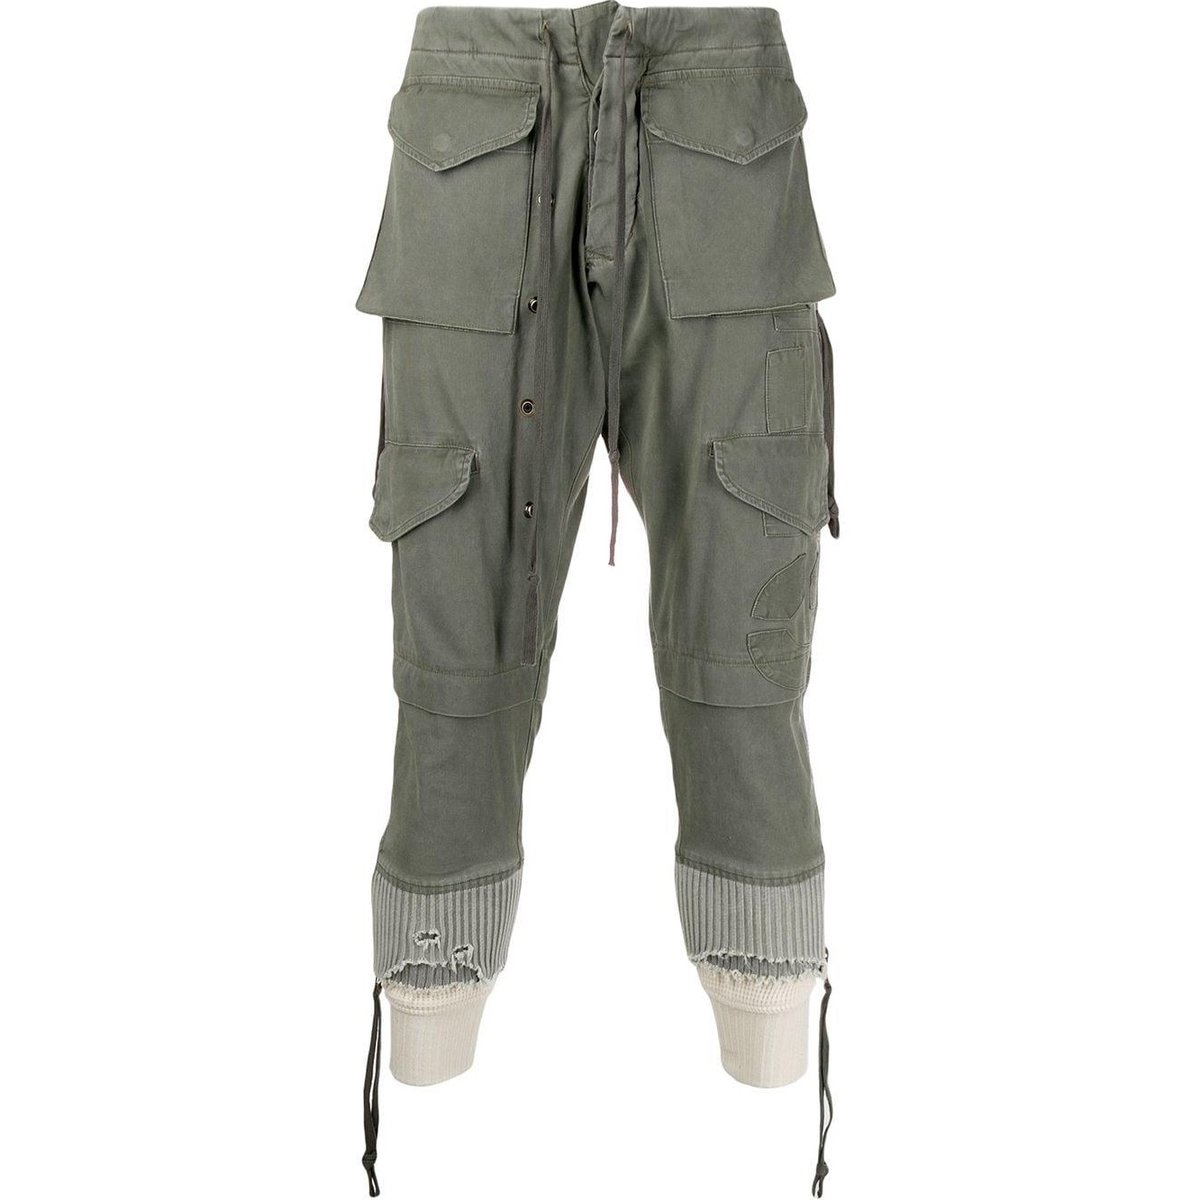 greg-lauren-Green-Marmy-Army-Pocket-Trousers.jpg